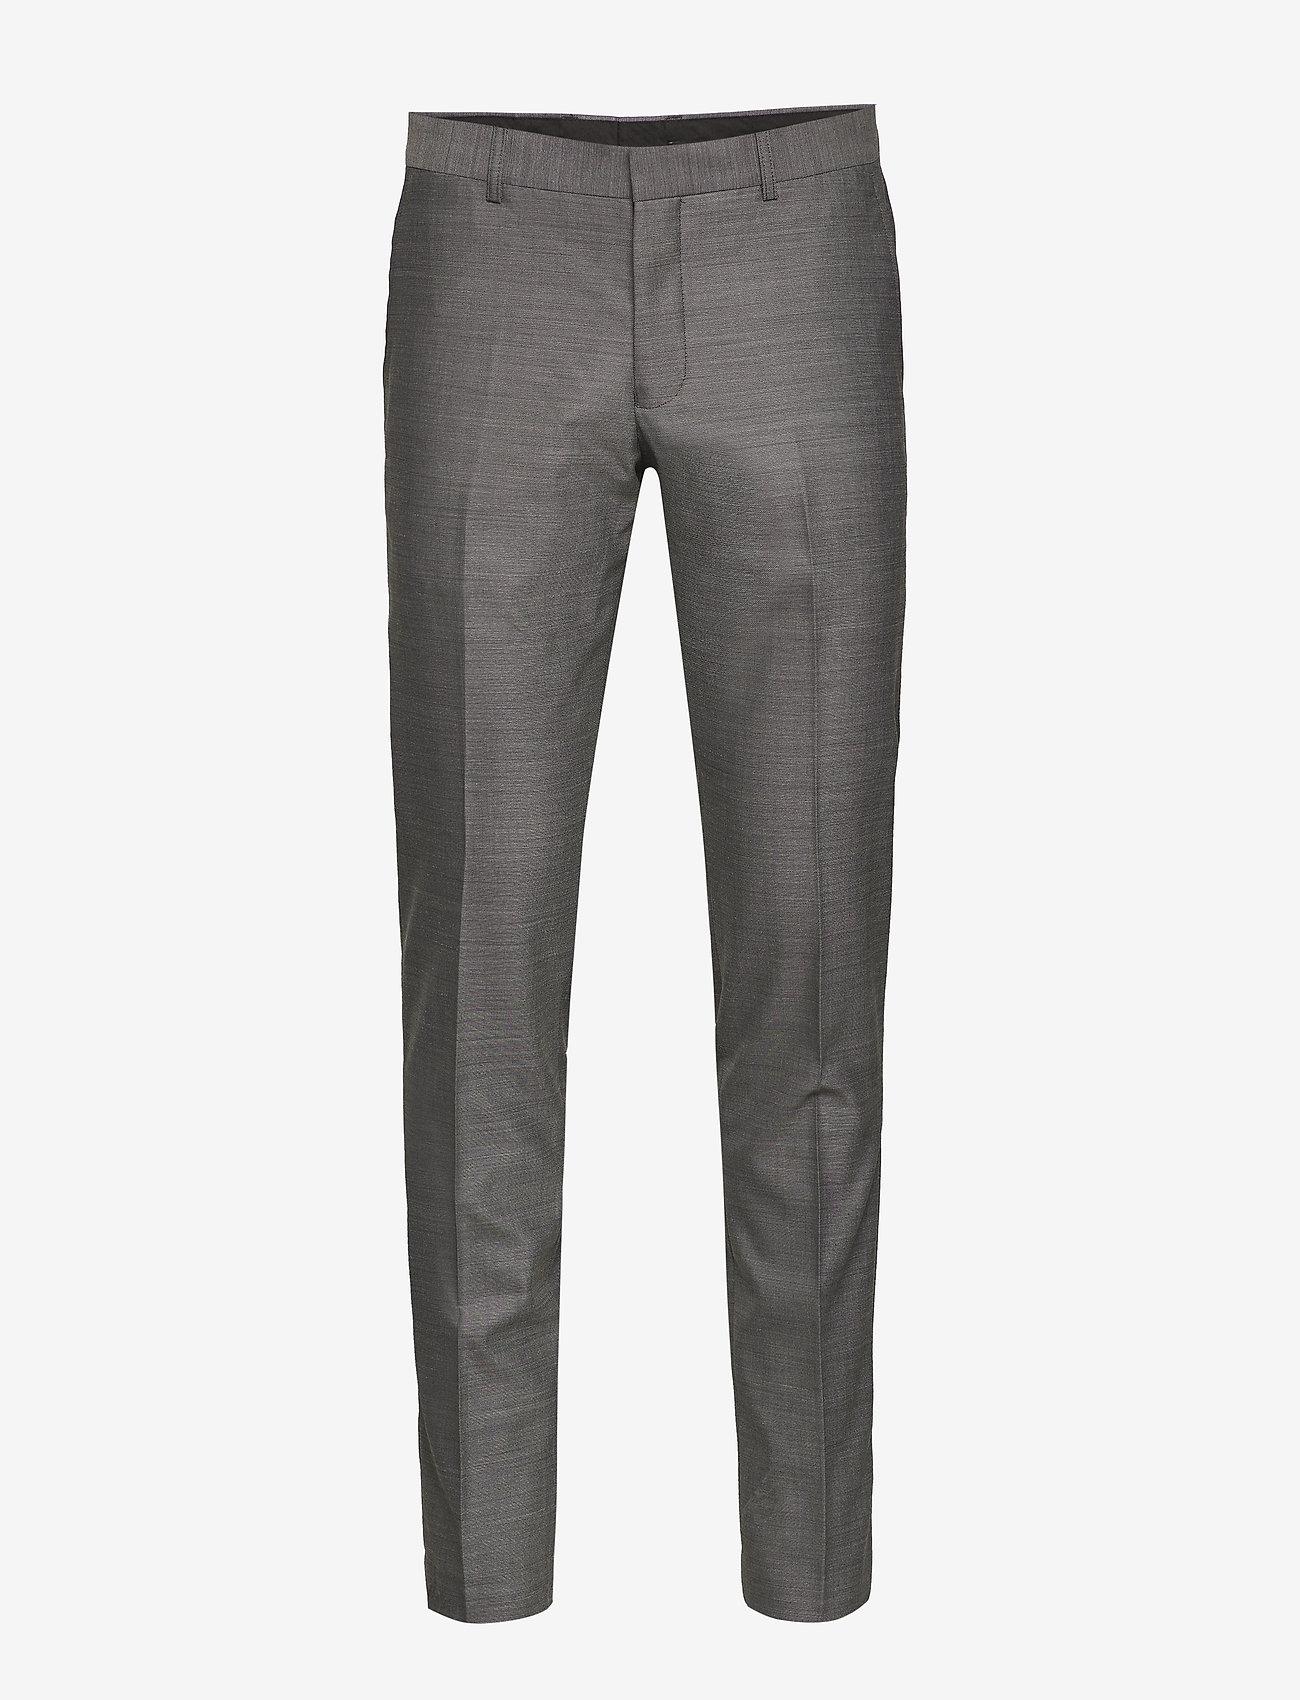 Matinique Melange Weave - Kostymer & Kavajer Light Grey